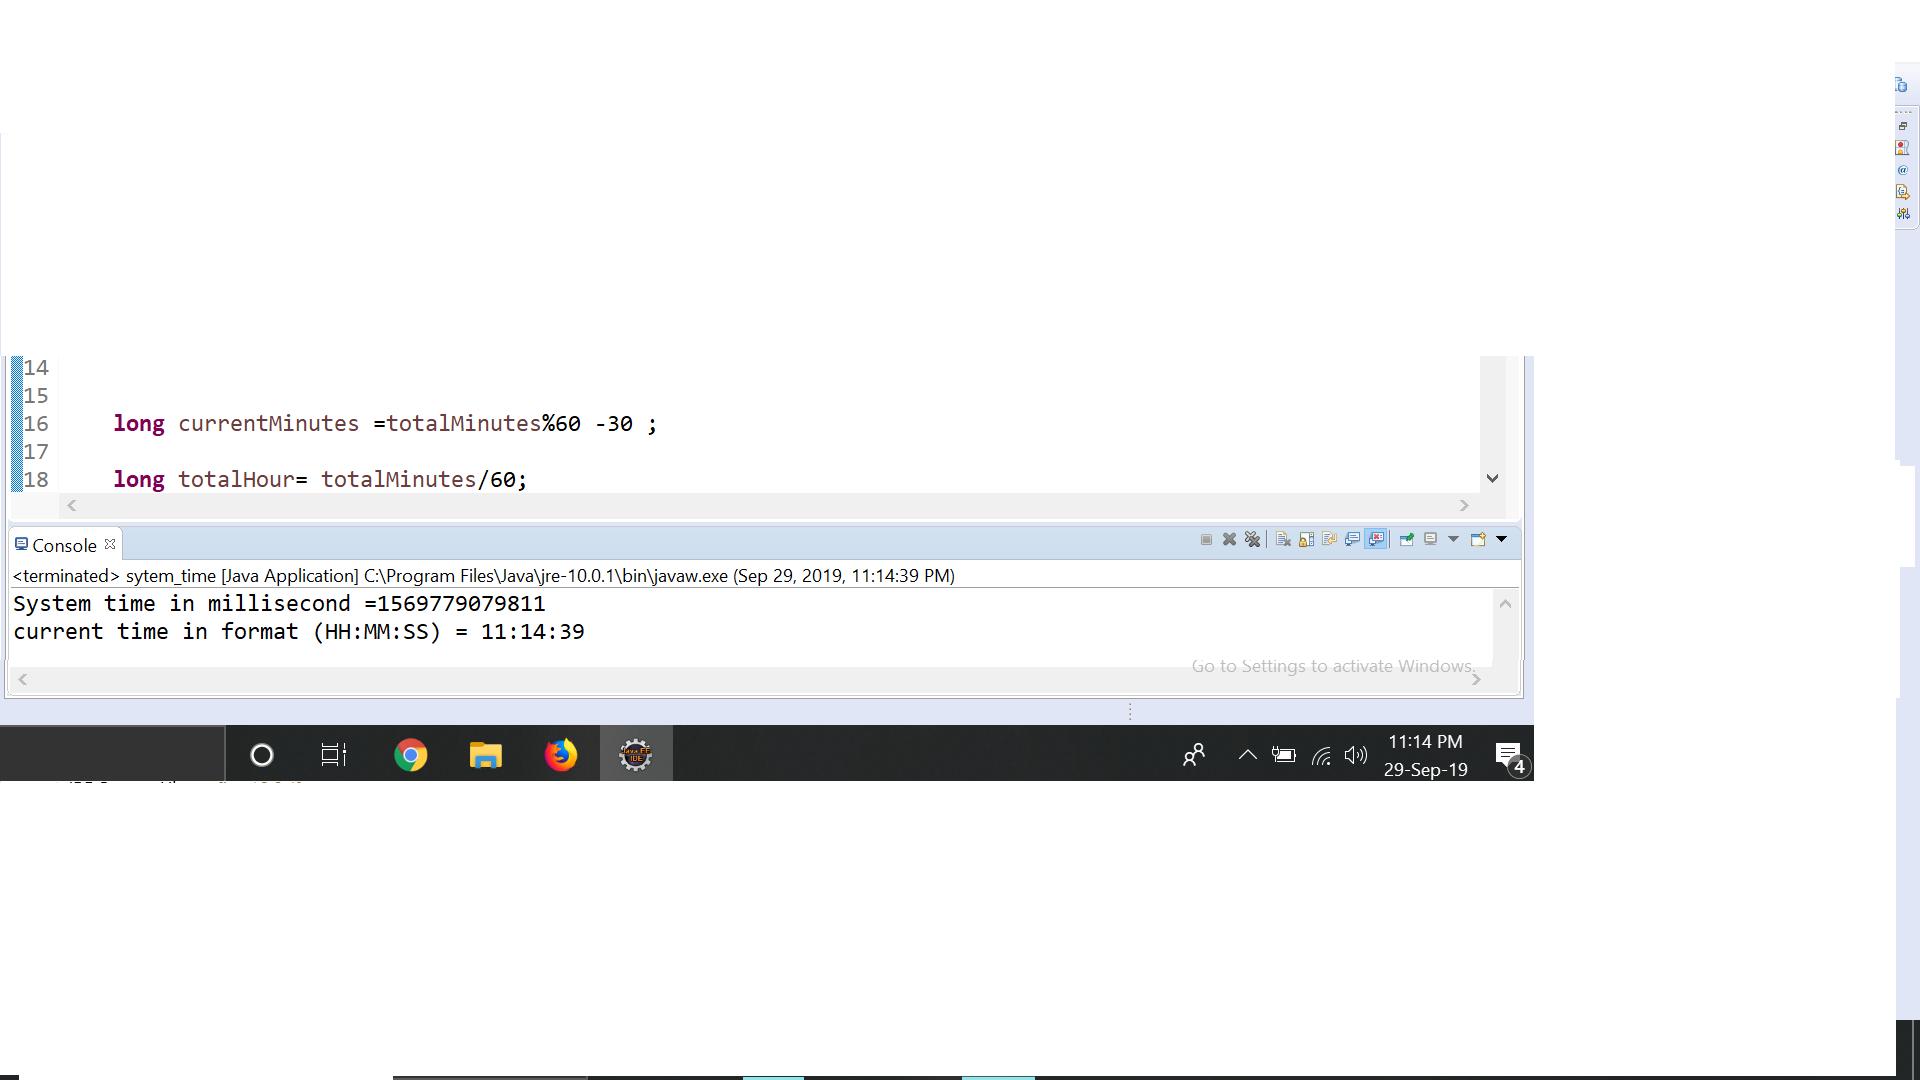 currentTimeMillis() Function In Java